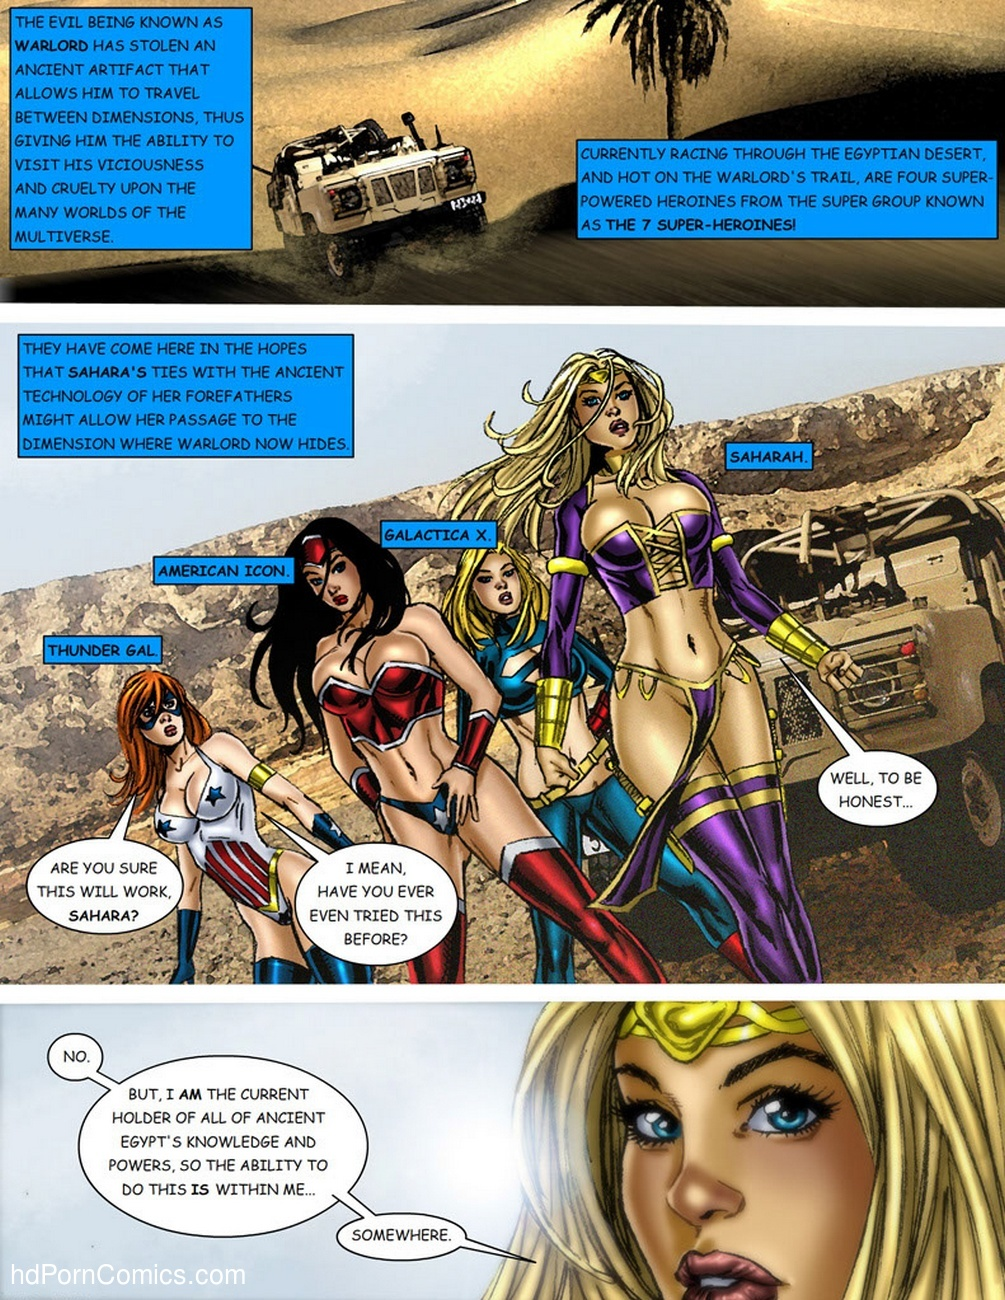 9 Superheroines VS Warlord 1 2 free sex comic